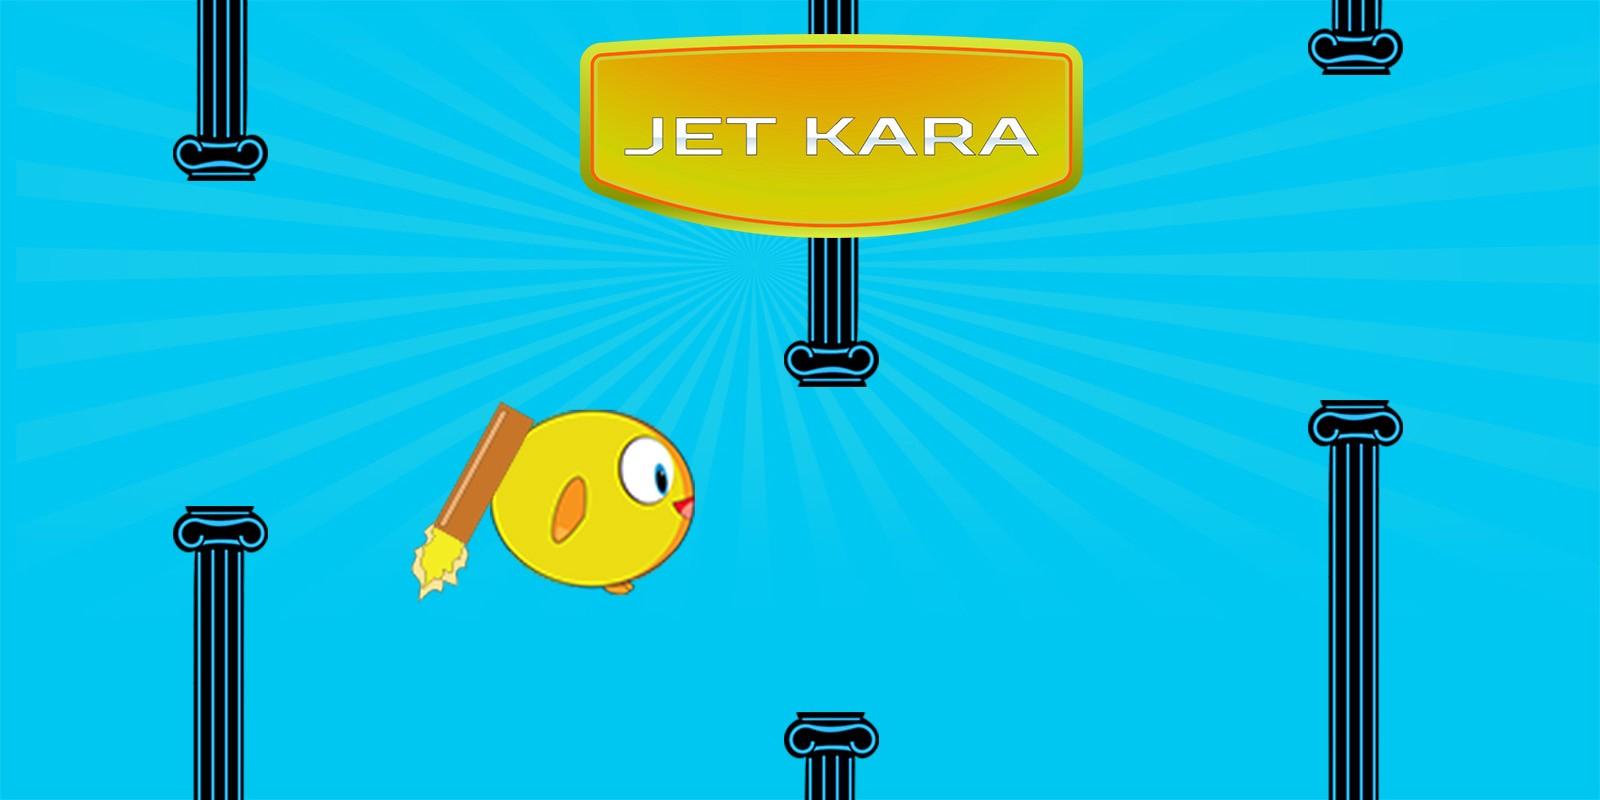 Jet Kara - Unity Game Source Code